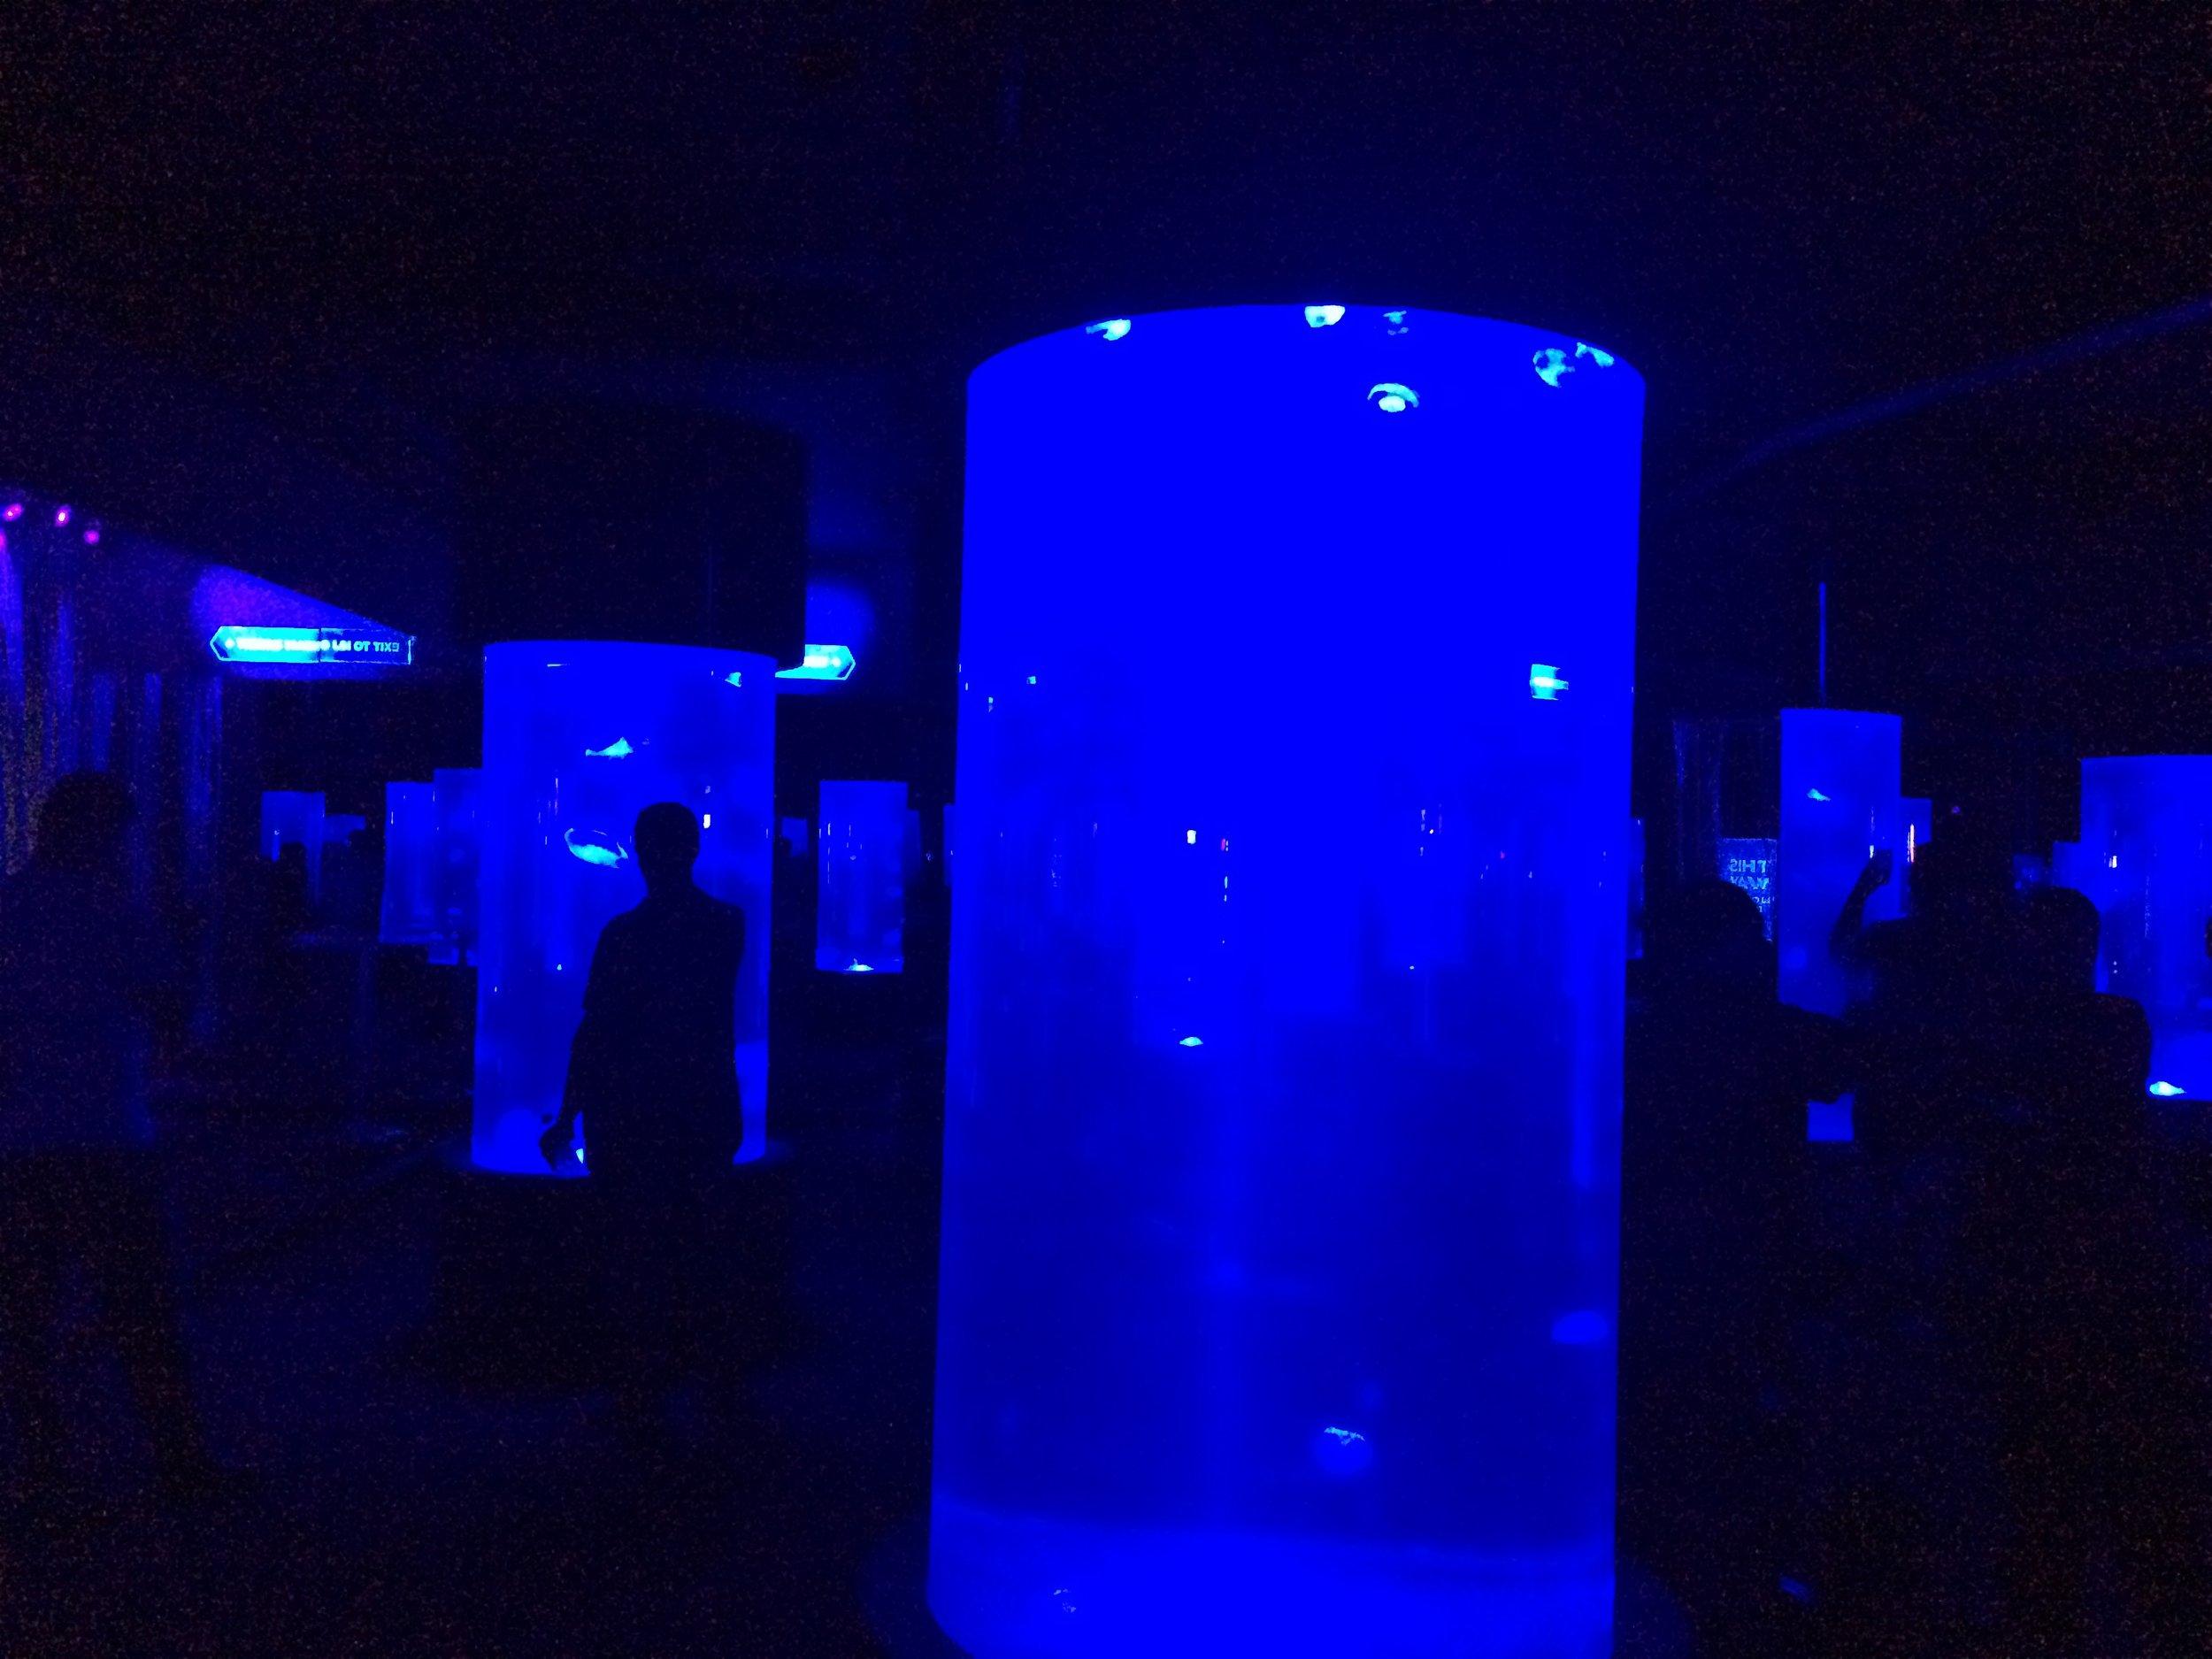 At the Cape Town Aquarium, pretty cool jellyfish room.